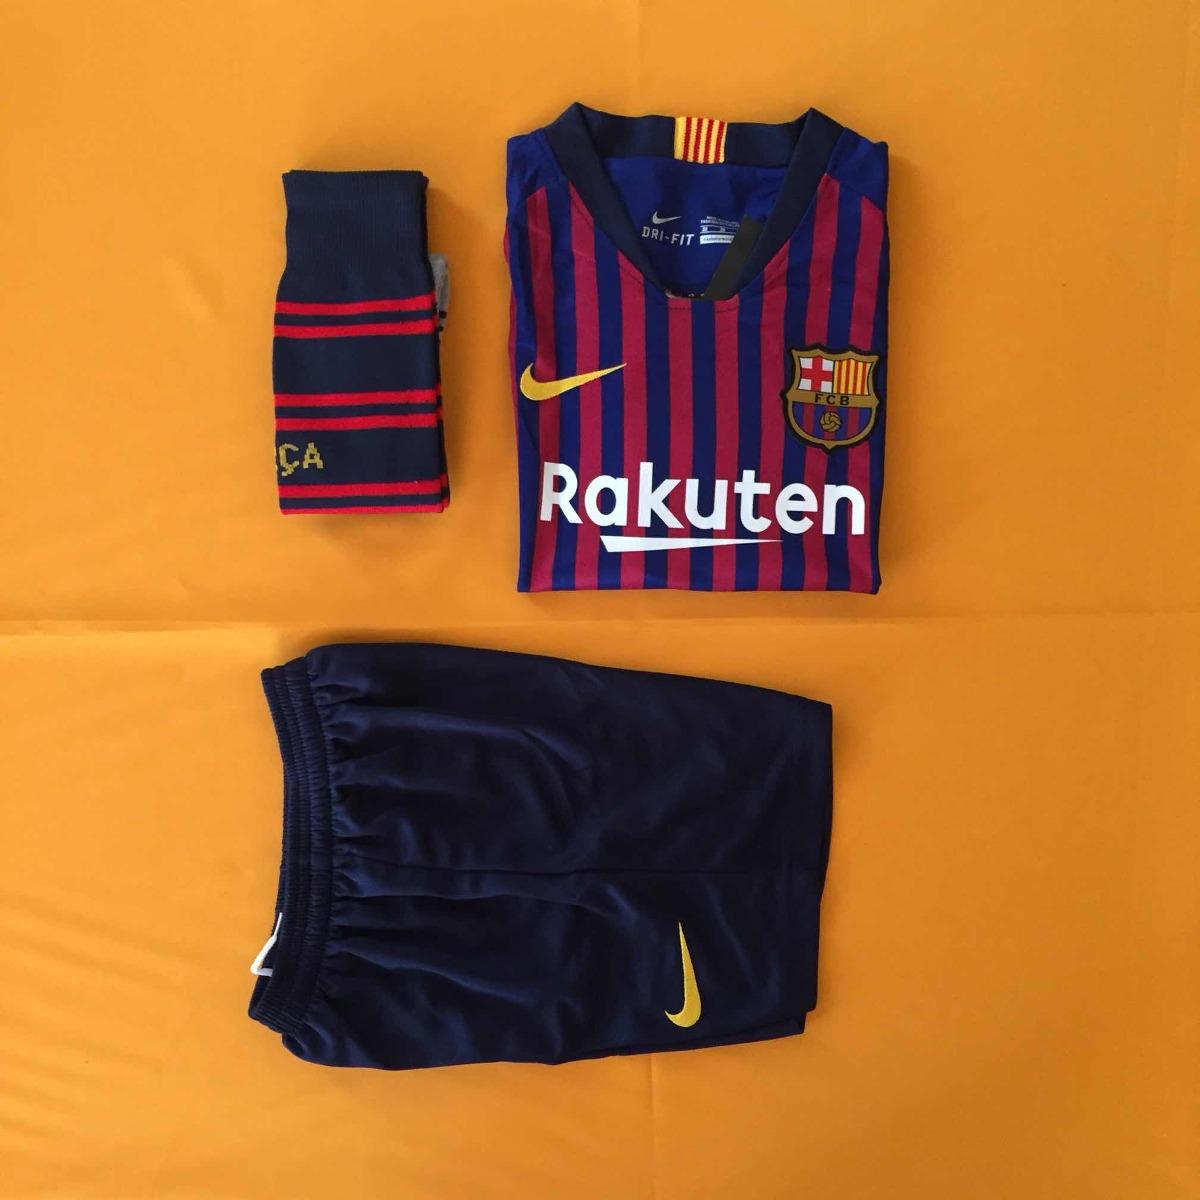 Camiseta Fútbol Niño Barcelona 2019 18 - Arturo Vidal -   24.990 en ... f42af702695